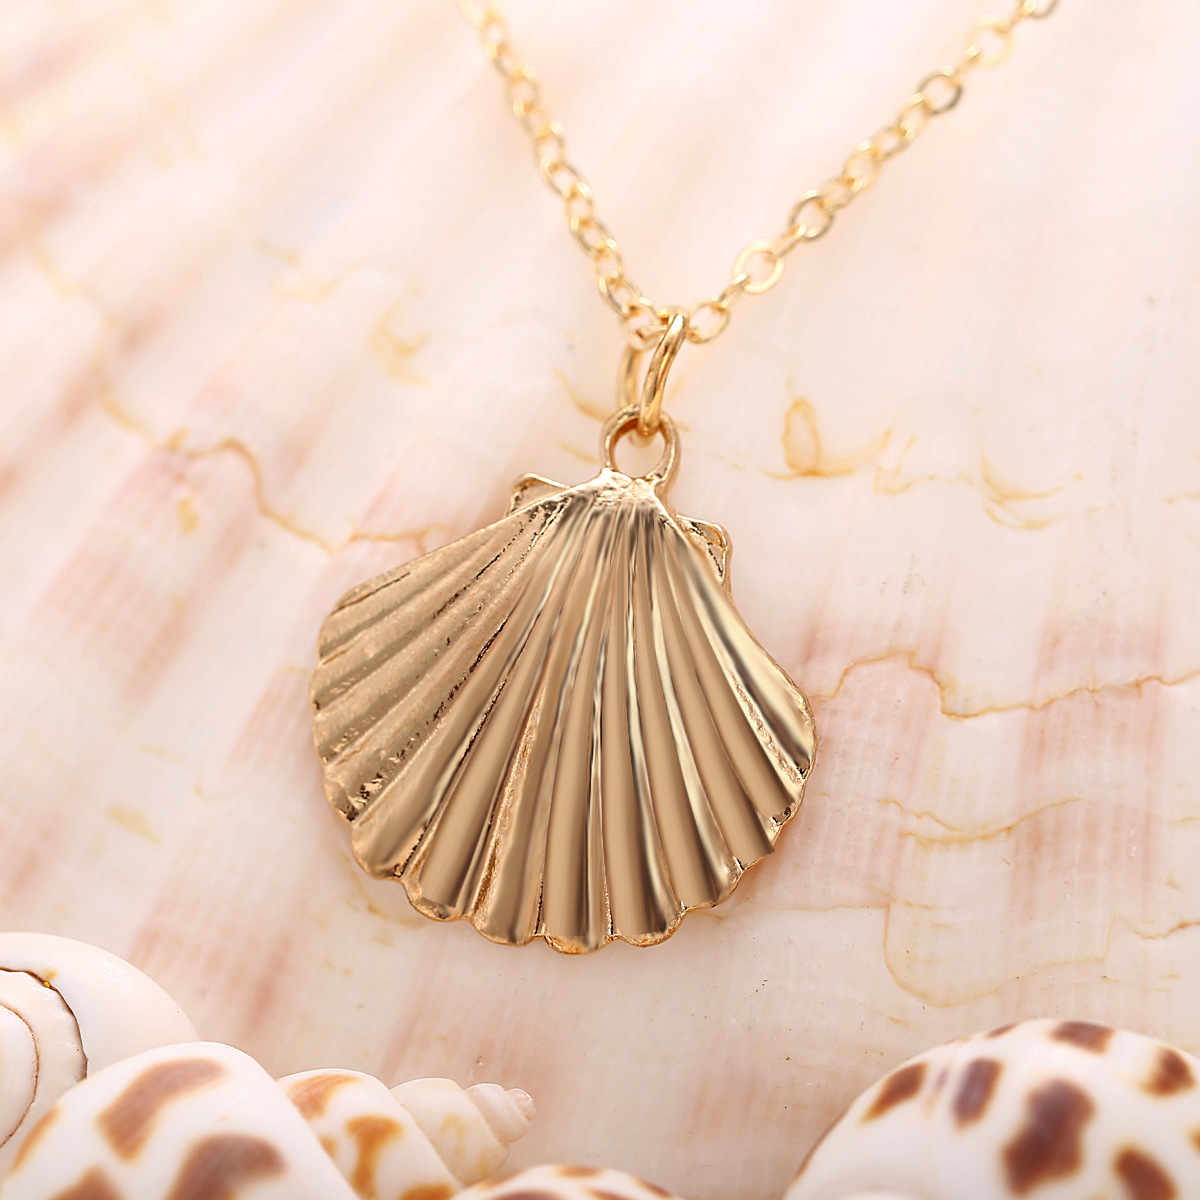 1Pc Gold Chain Necklace Natural Sea Conch Shell Pendant Hawaiian Fashion Jewelry